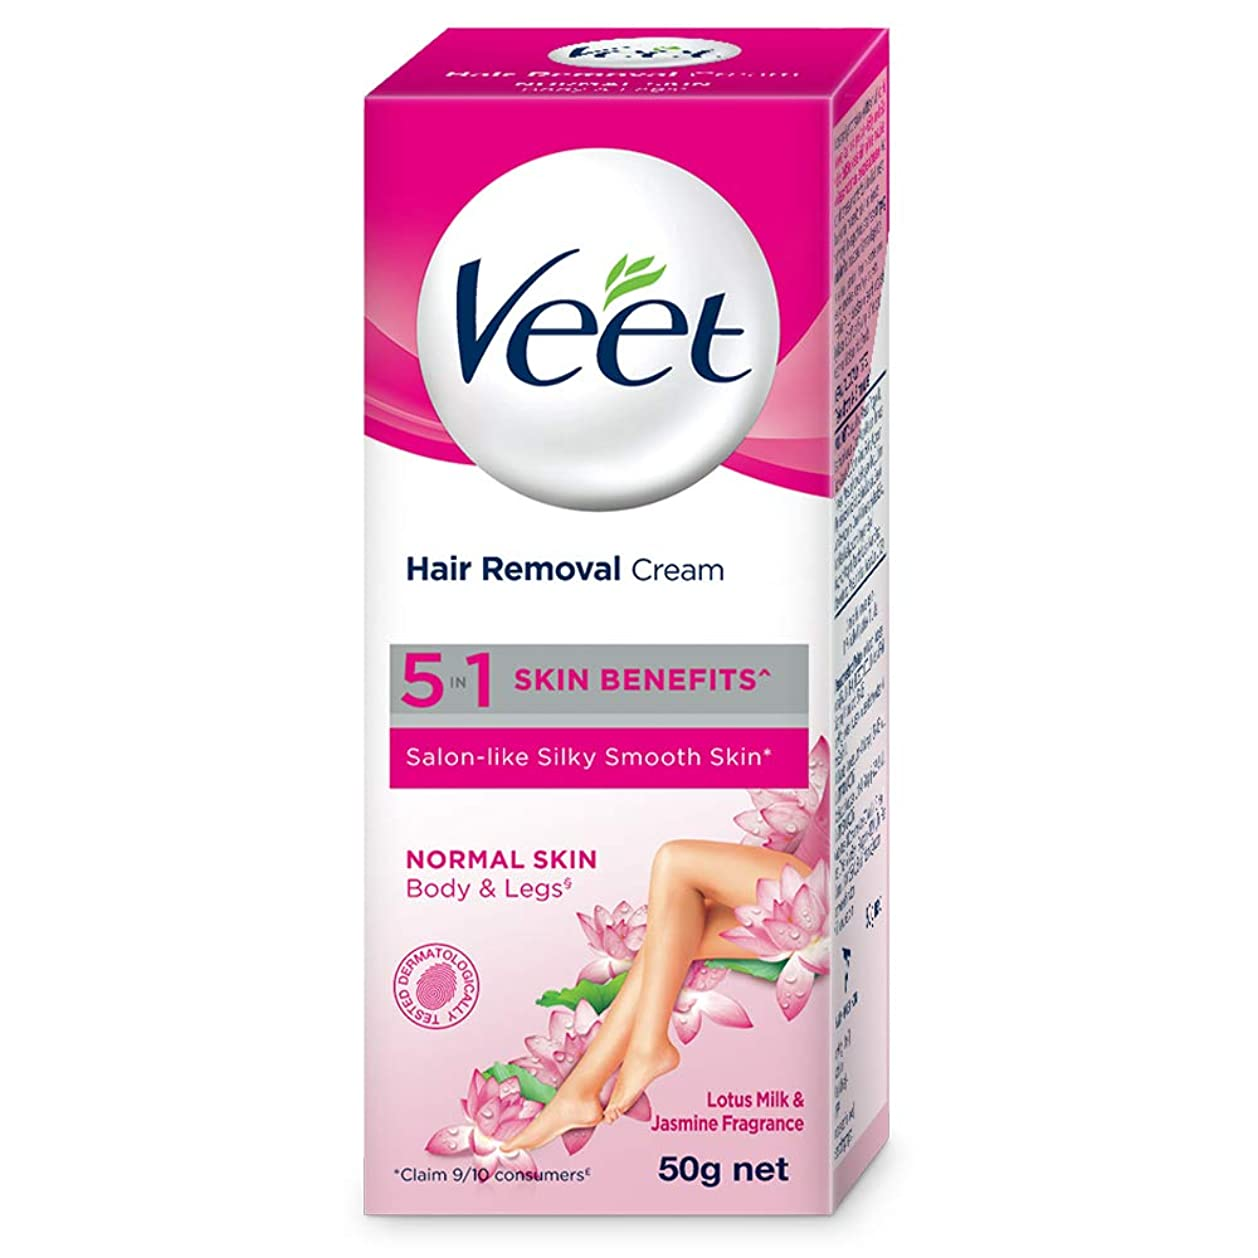 靴下支出楕円形Veet Hair Removal Cream - Normal Skin 50gm